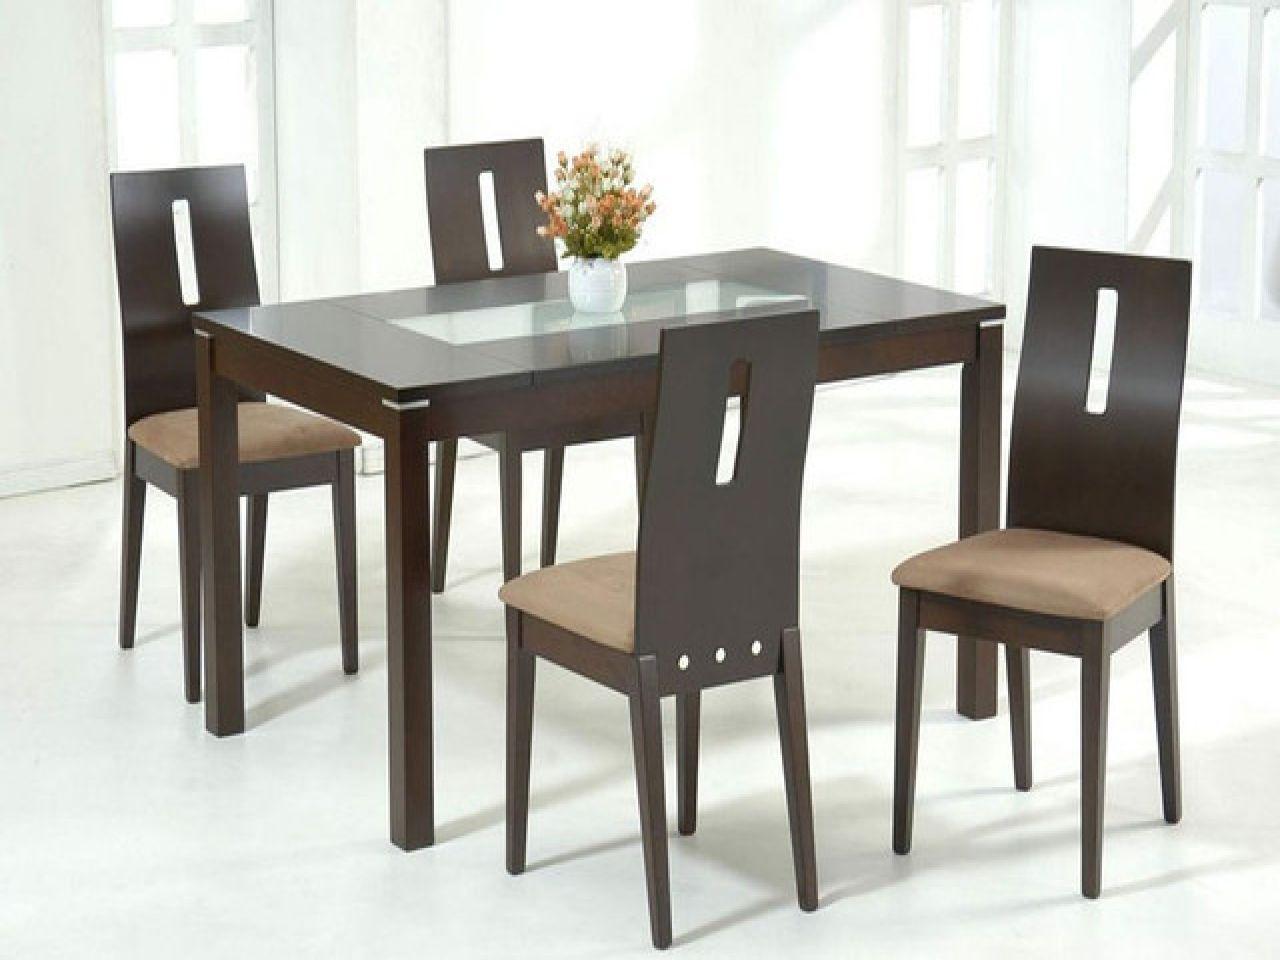 Room Tables Glass Top Dining Table Sets Modern Tops Meja Makan Set Meja Makan Desain Dining room stores best free home